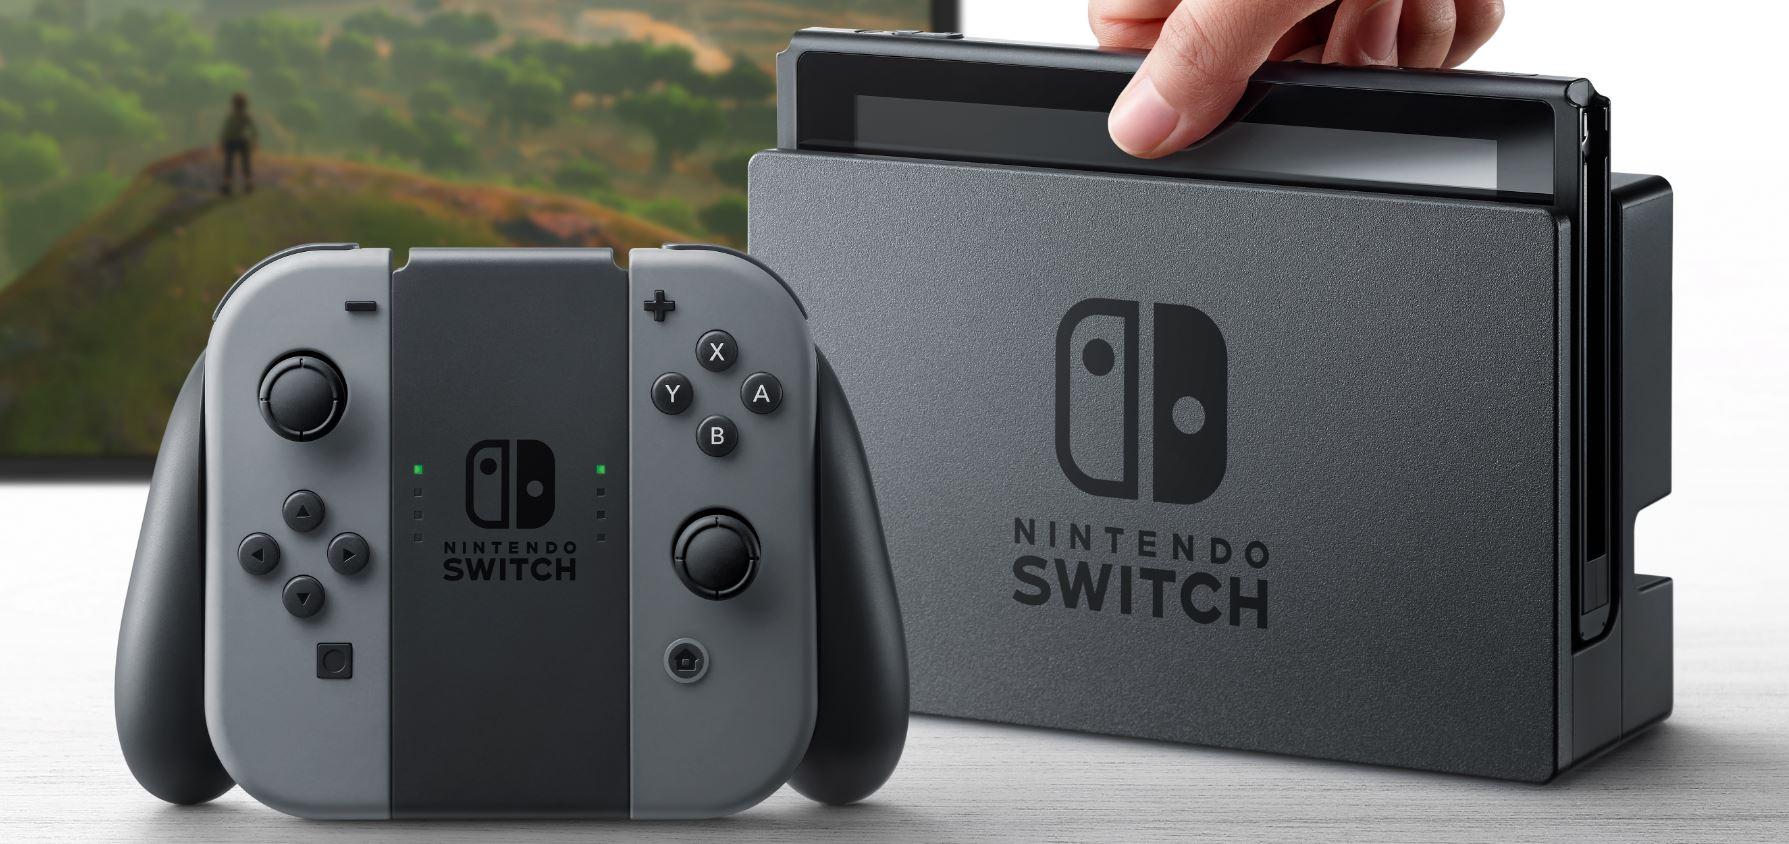 【NX】任天堂新型ハード「Nintendo Switch」発表!!!